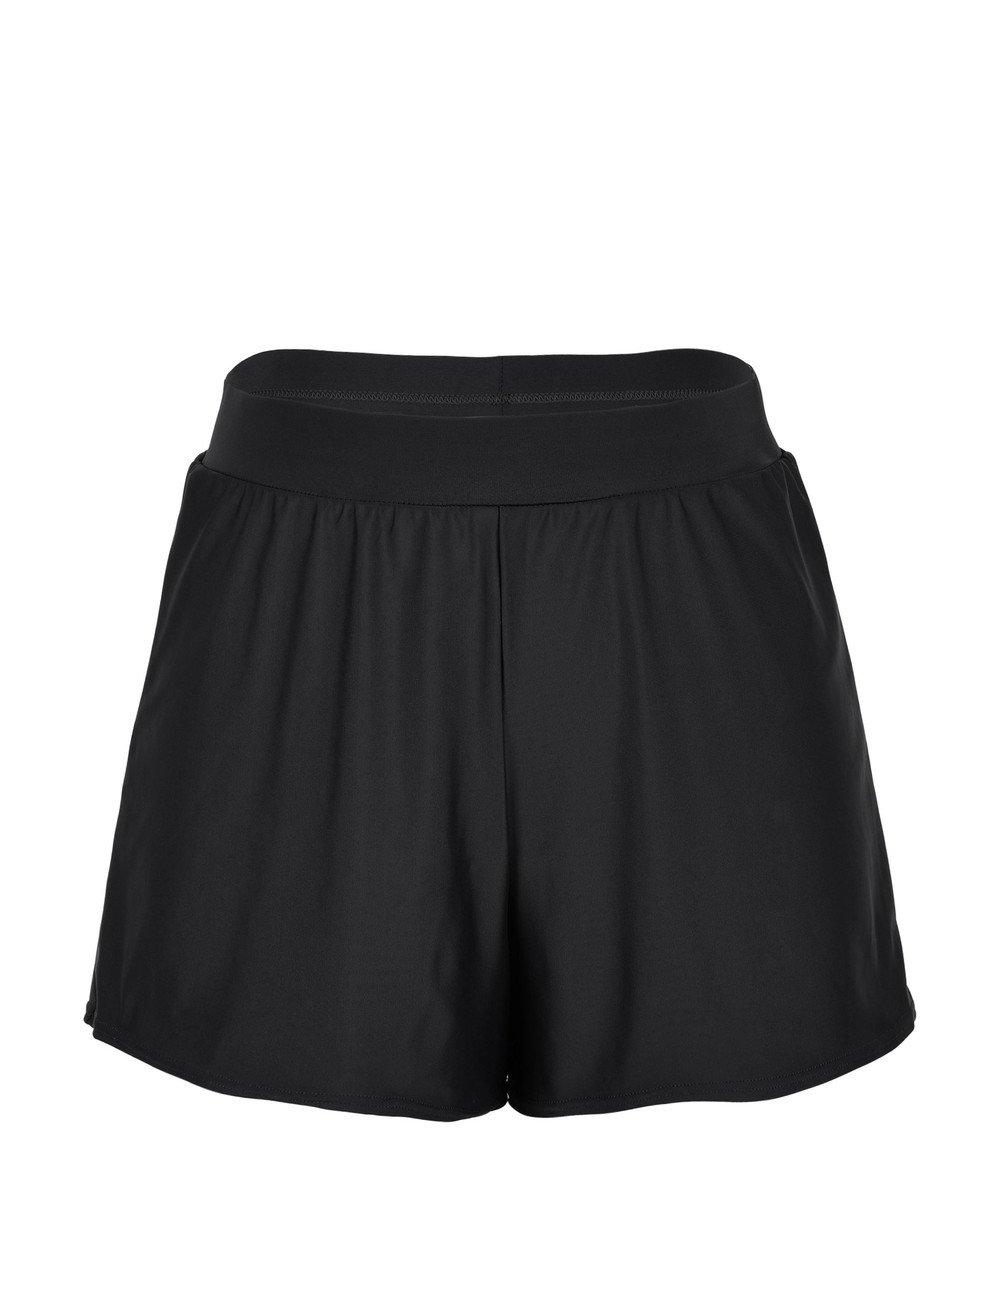 ninovino Women's Boardshorts A-Line Loose Swim Shorts With Briefs Black US12